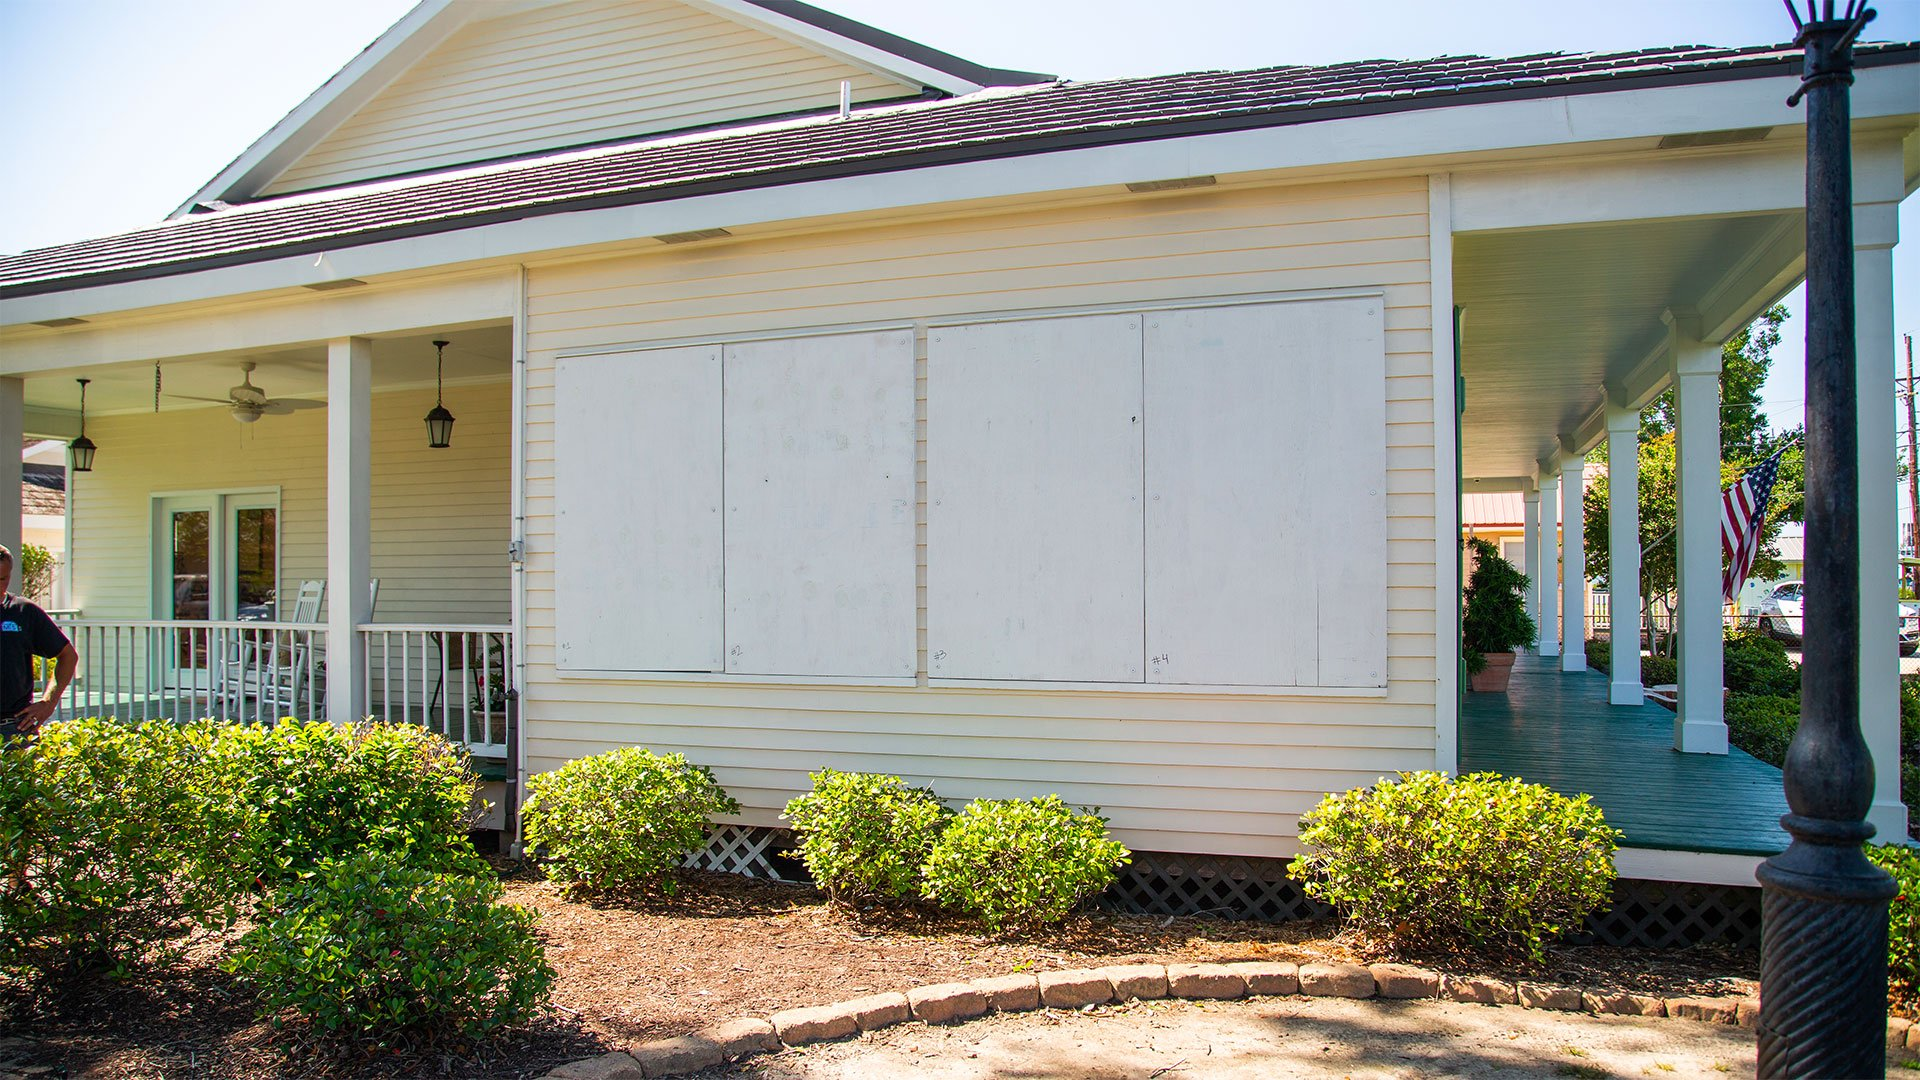 Louisiana home, seen with hurricane shutters